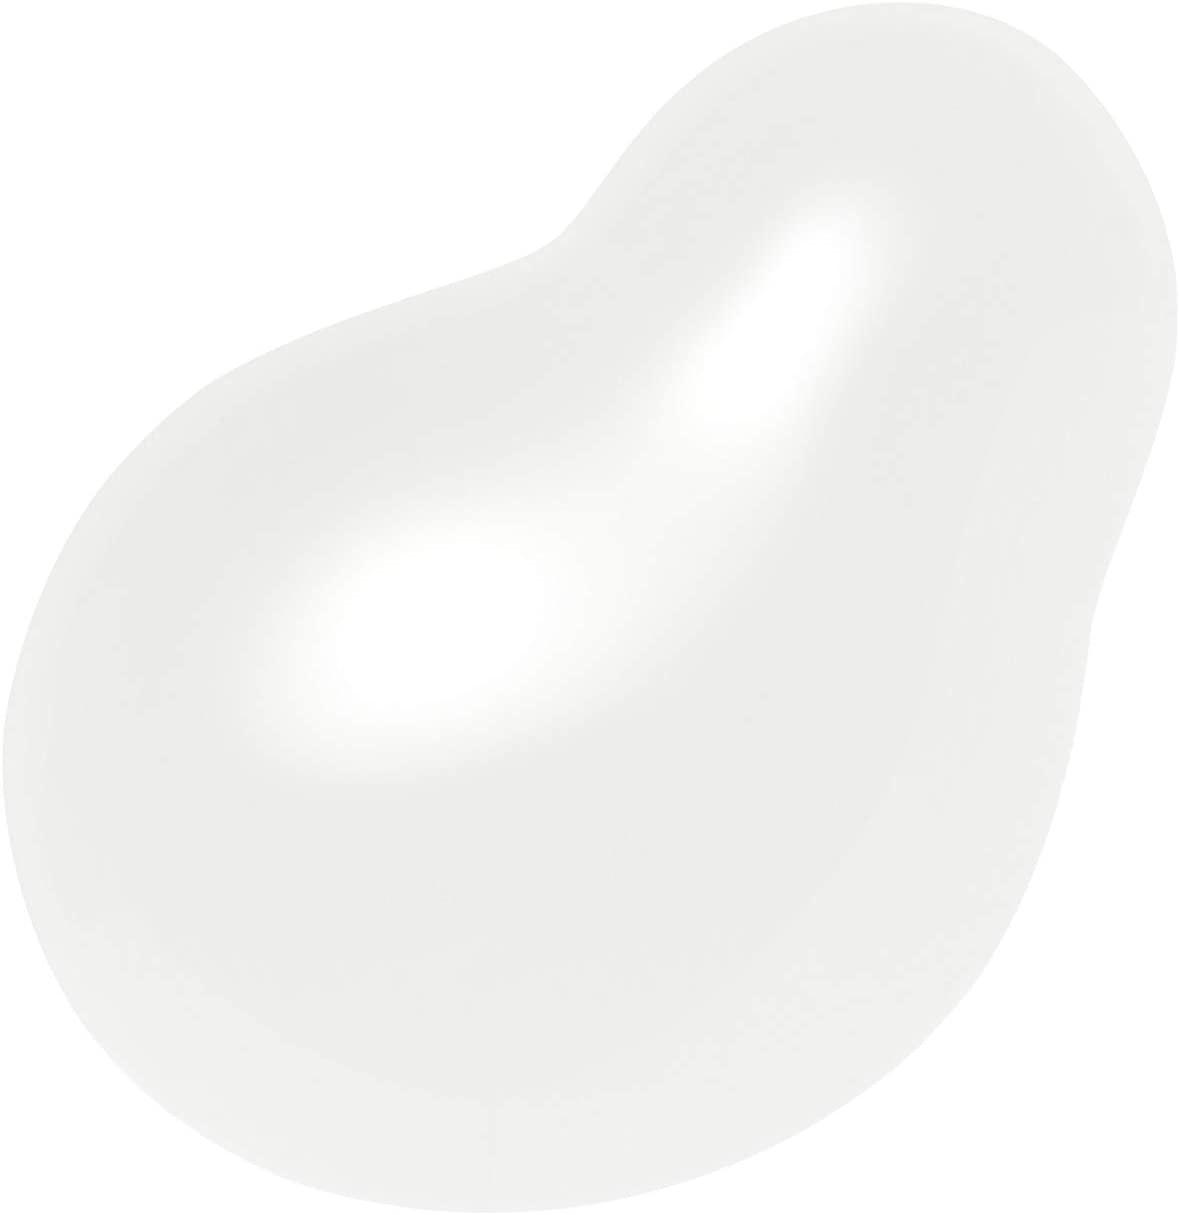 ONLY MINERALS(オンリーミネラル) NudeファーストCブーストの商品画像3